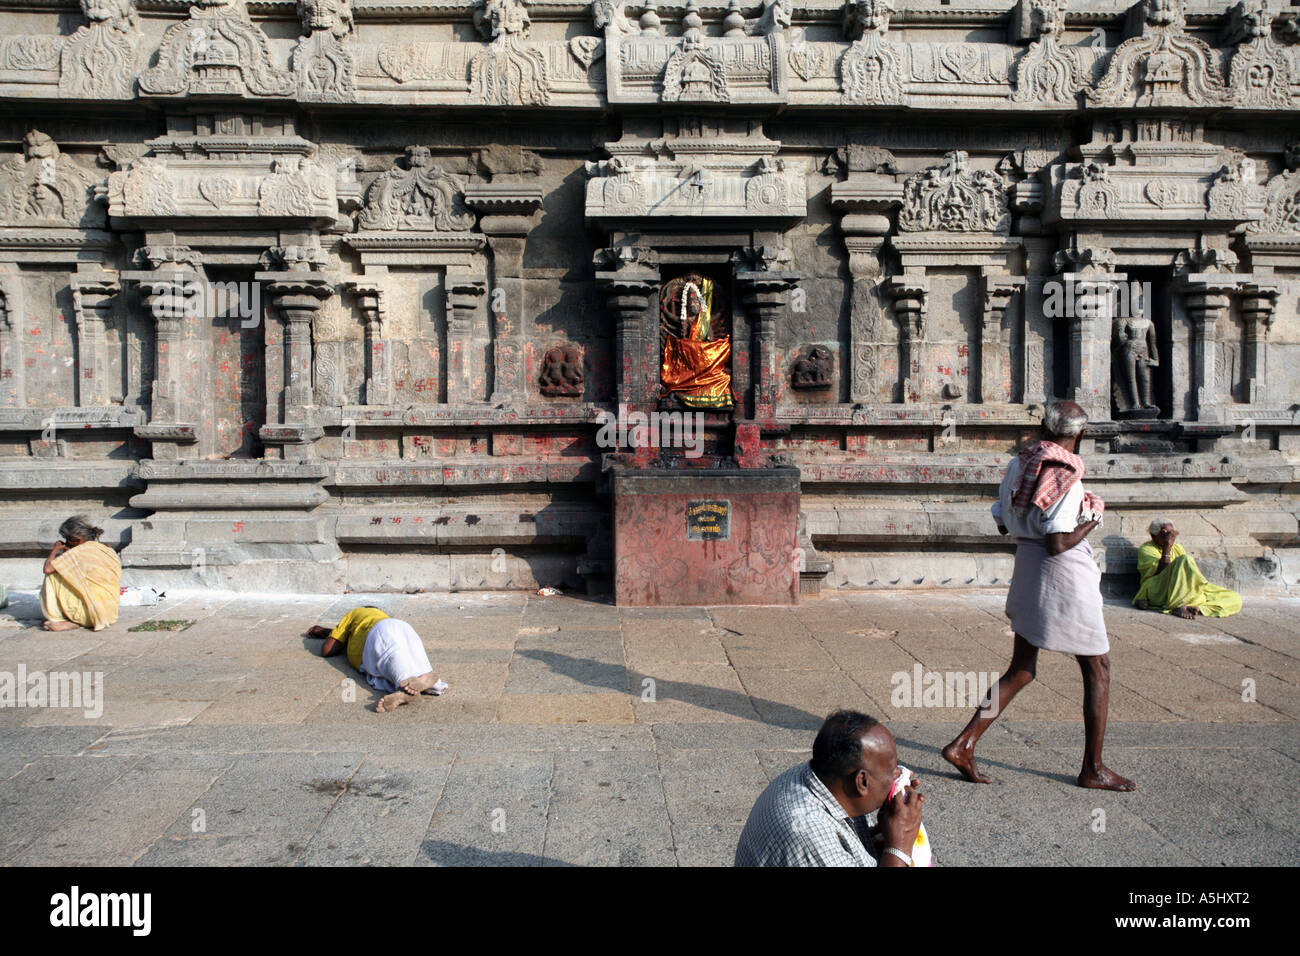 People visiting Arunachaleswar temple in Tiruvannamalai, Tamil Nadu, India - Stock Image